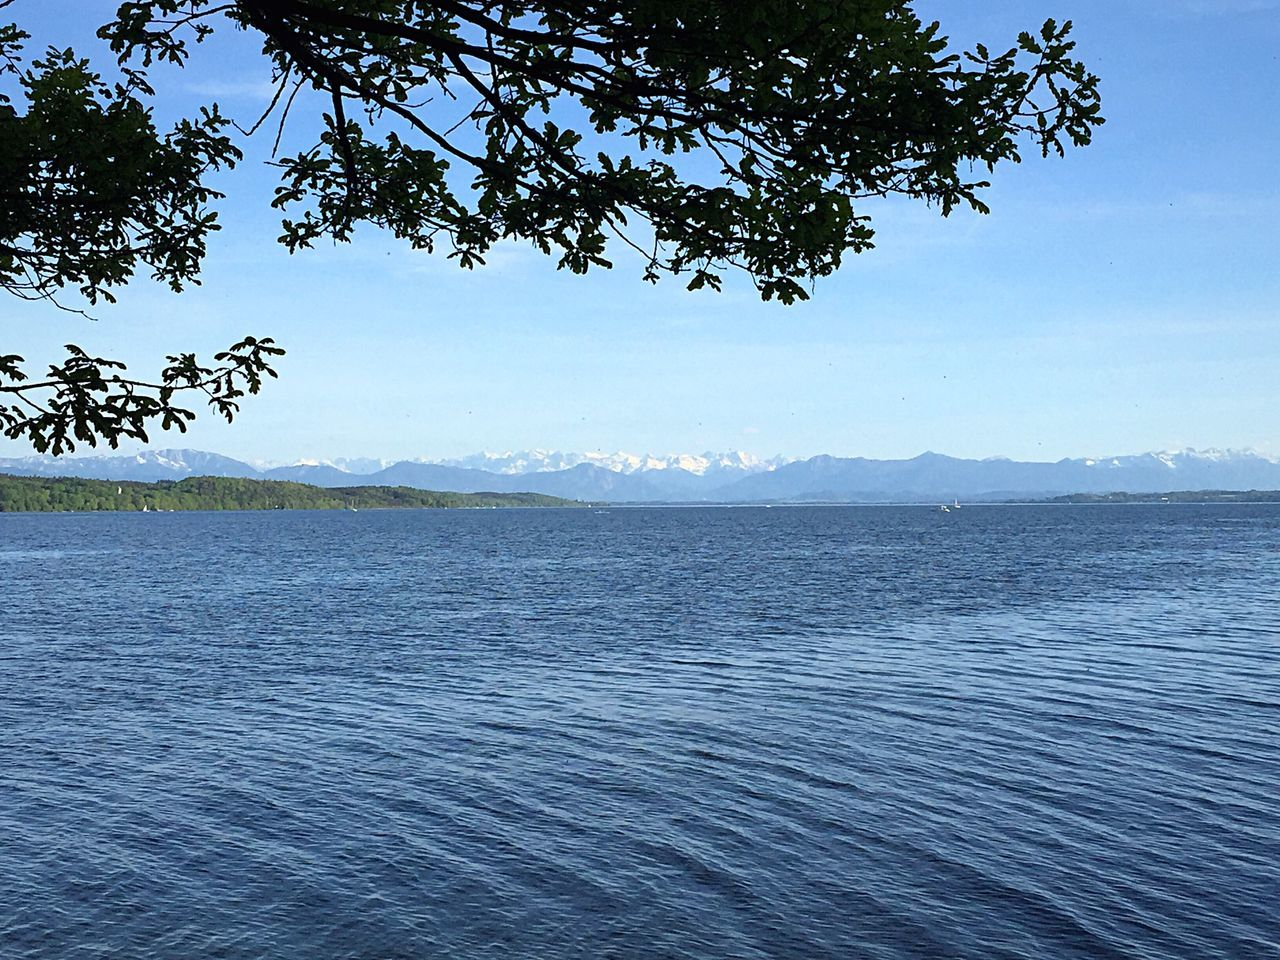 Beauty In Nature Water Sea No People Bäume Und Himmel Starnbergersee Baum Berge Himmel Wälder Wasser